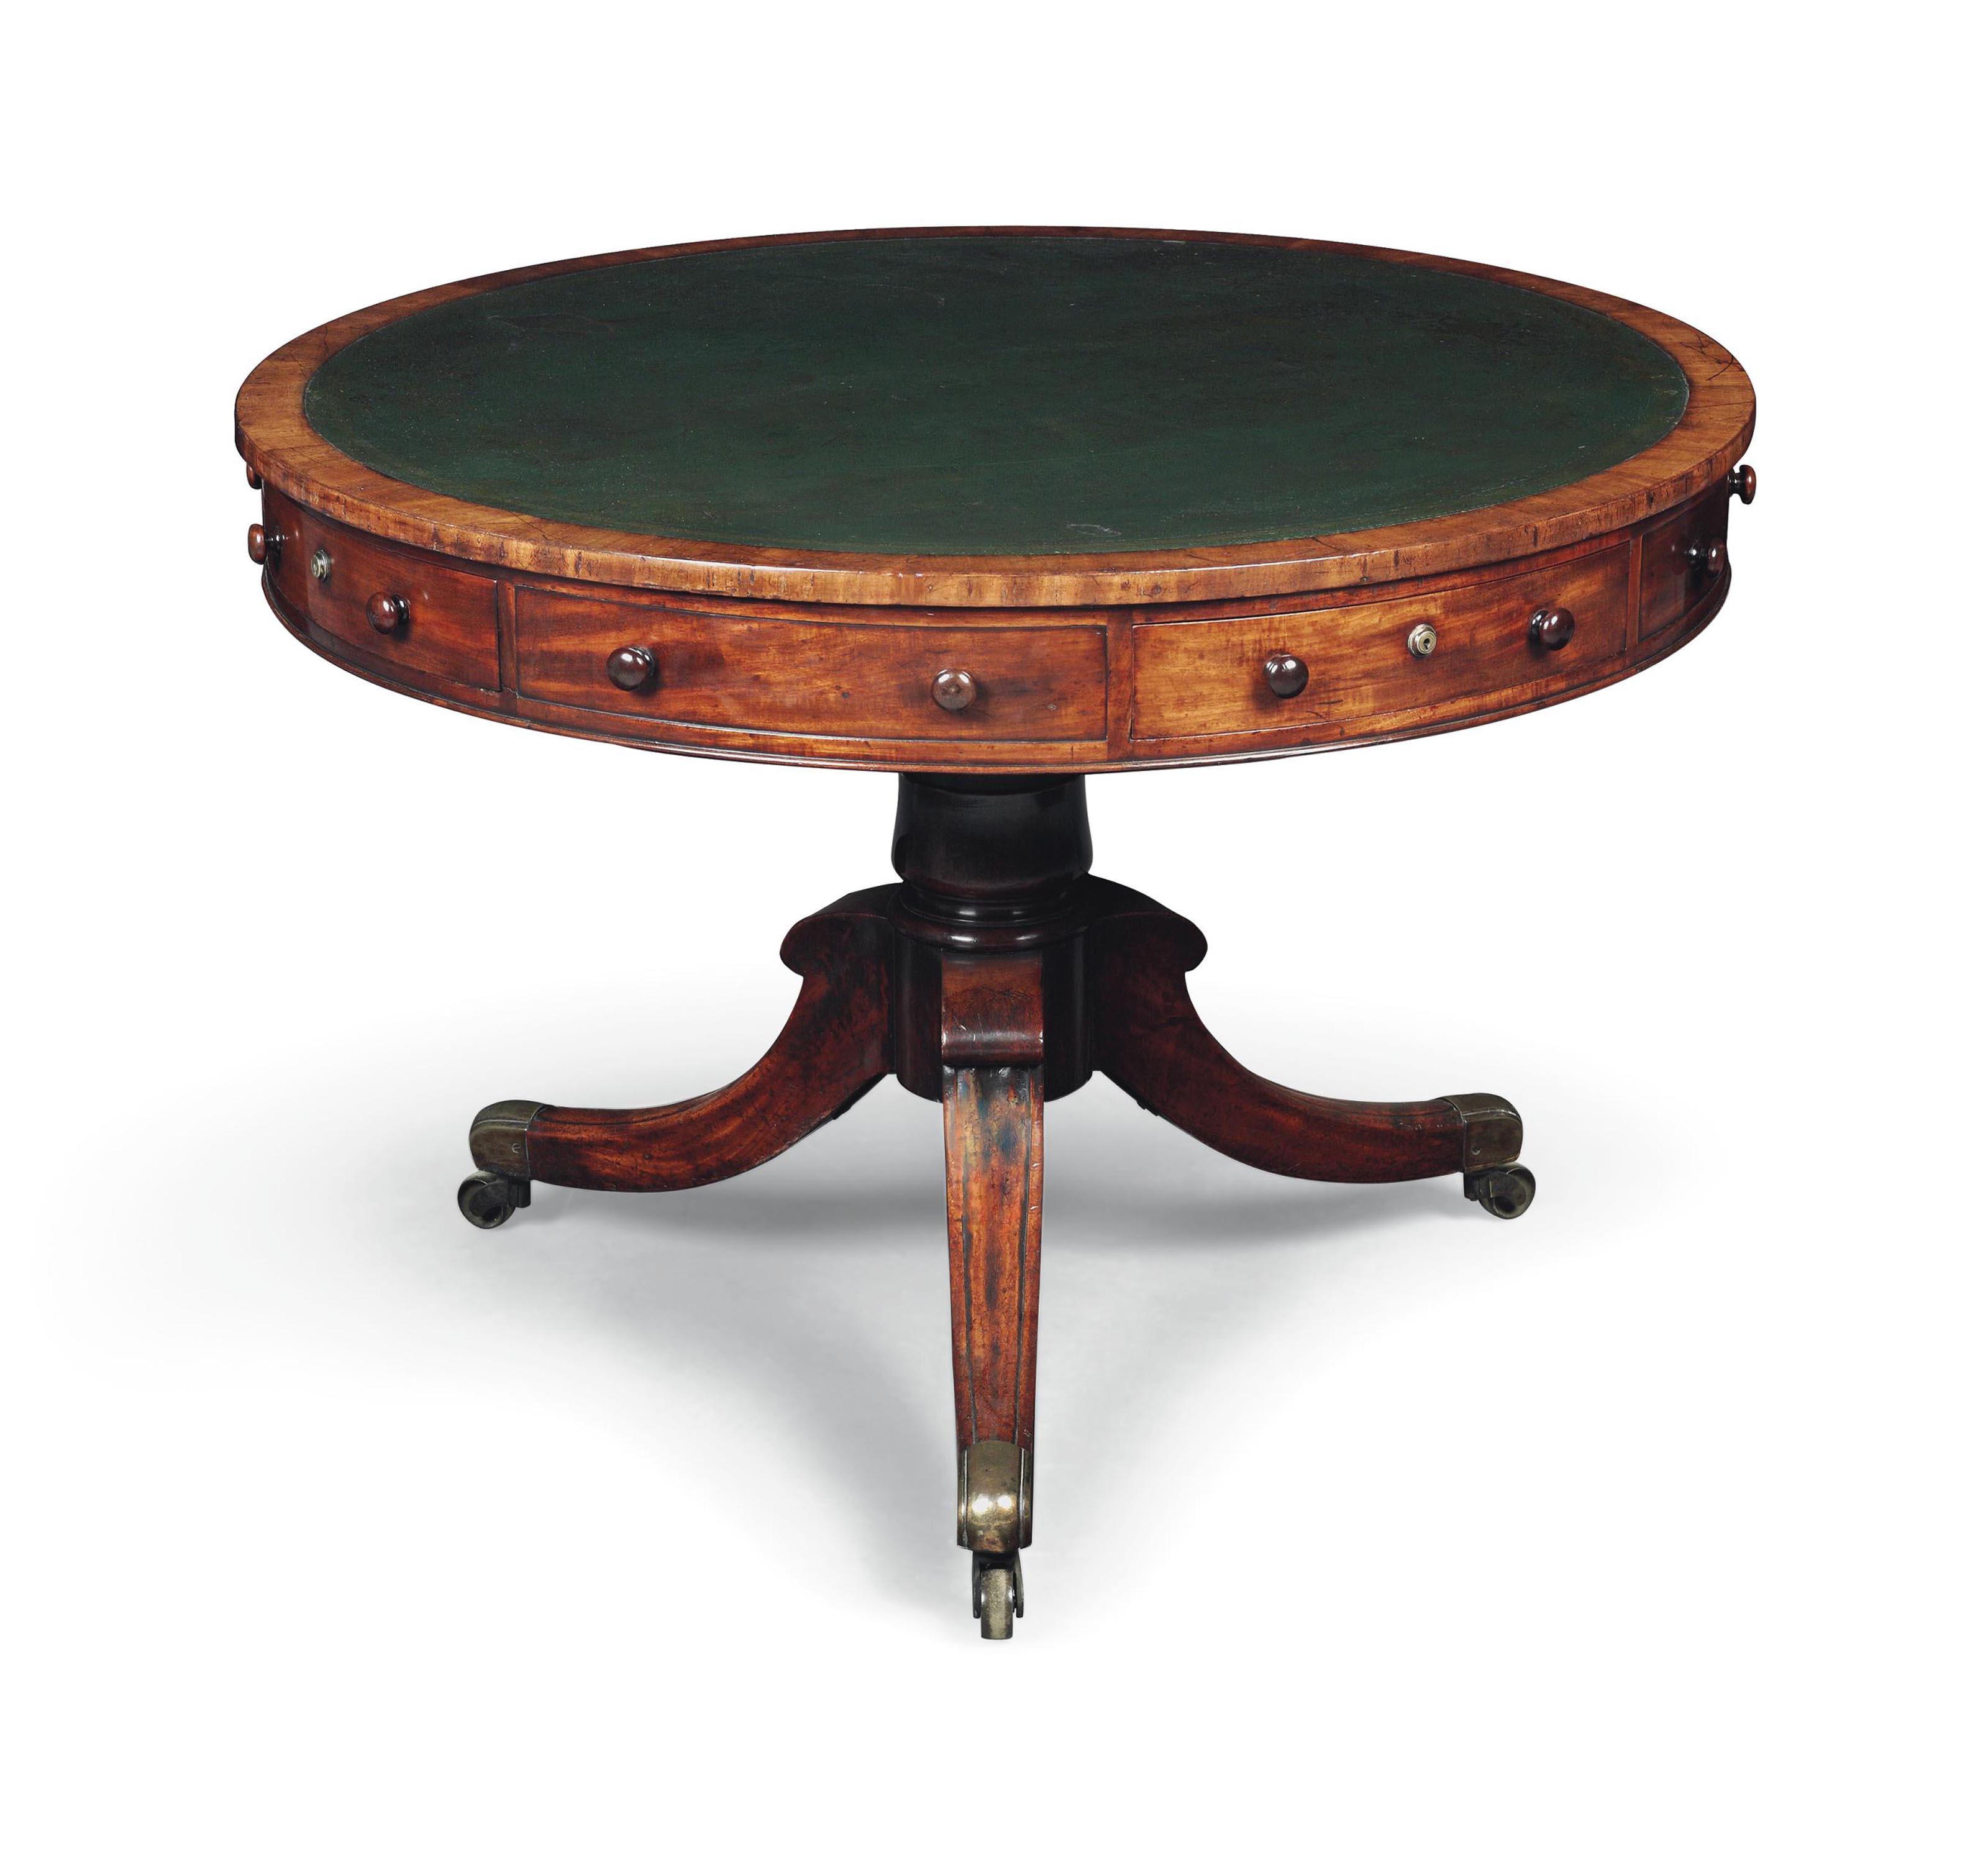 A REGENCY MAHOGANY DRUM TABLE